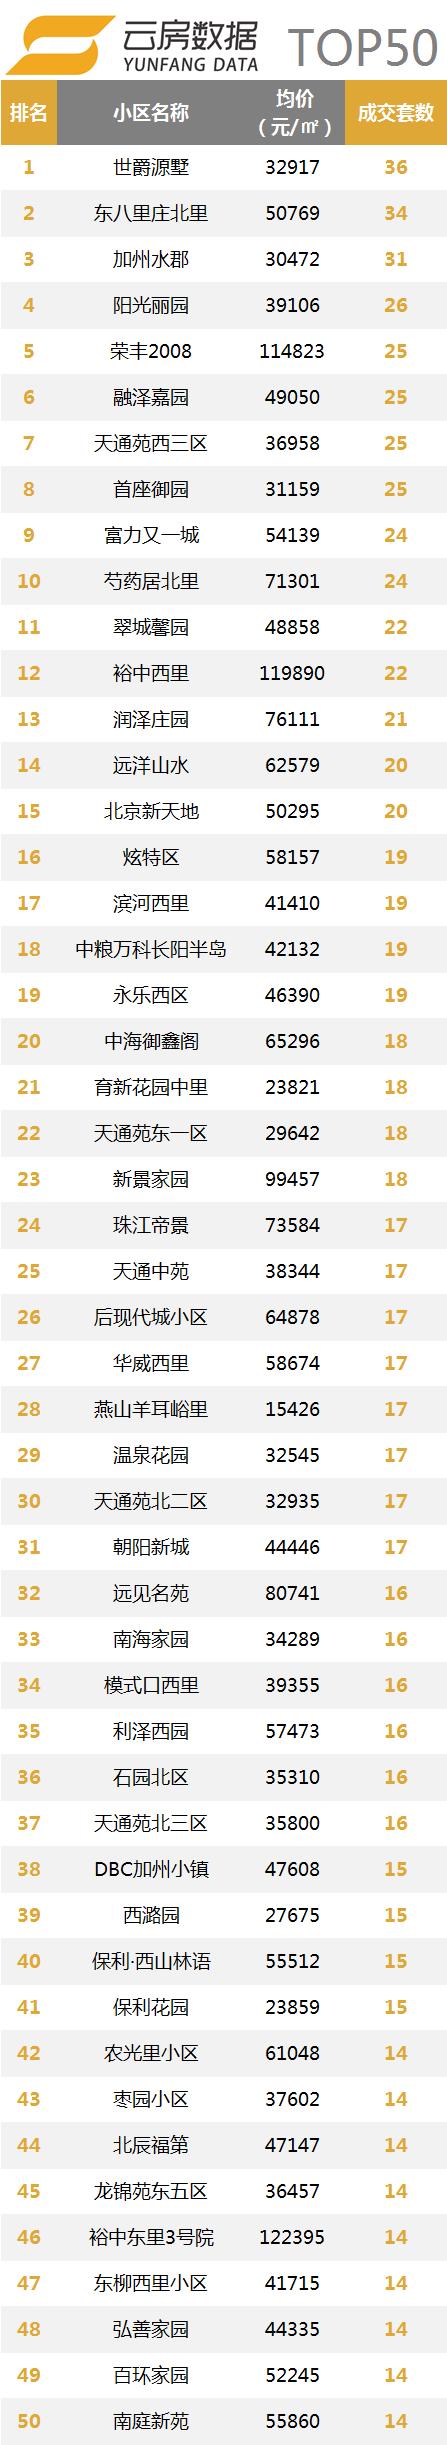 top50.png